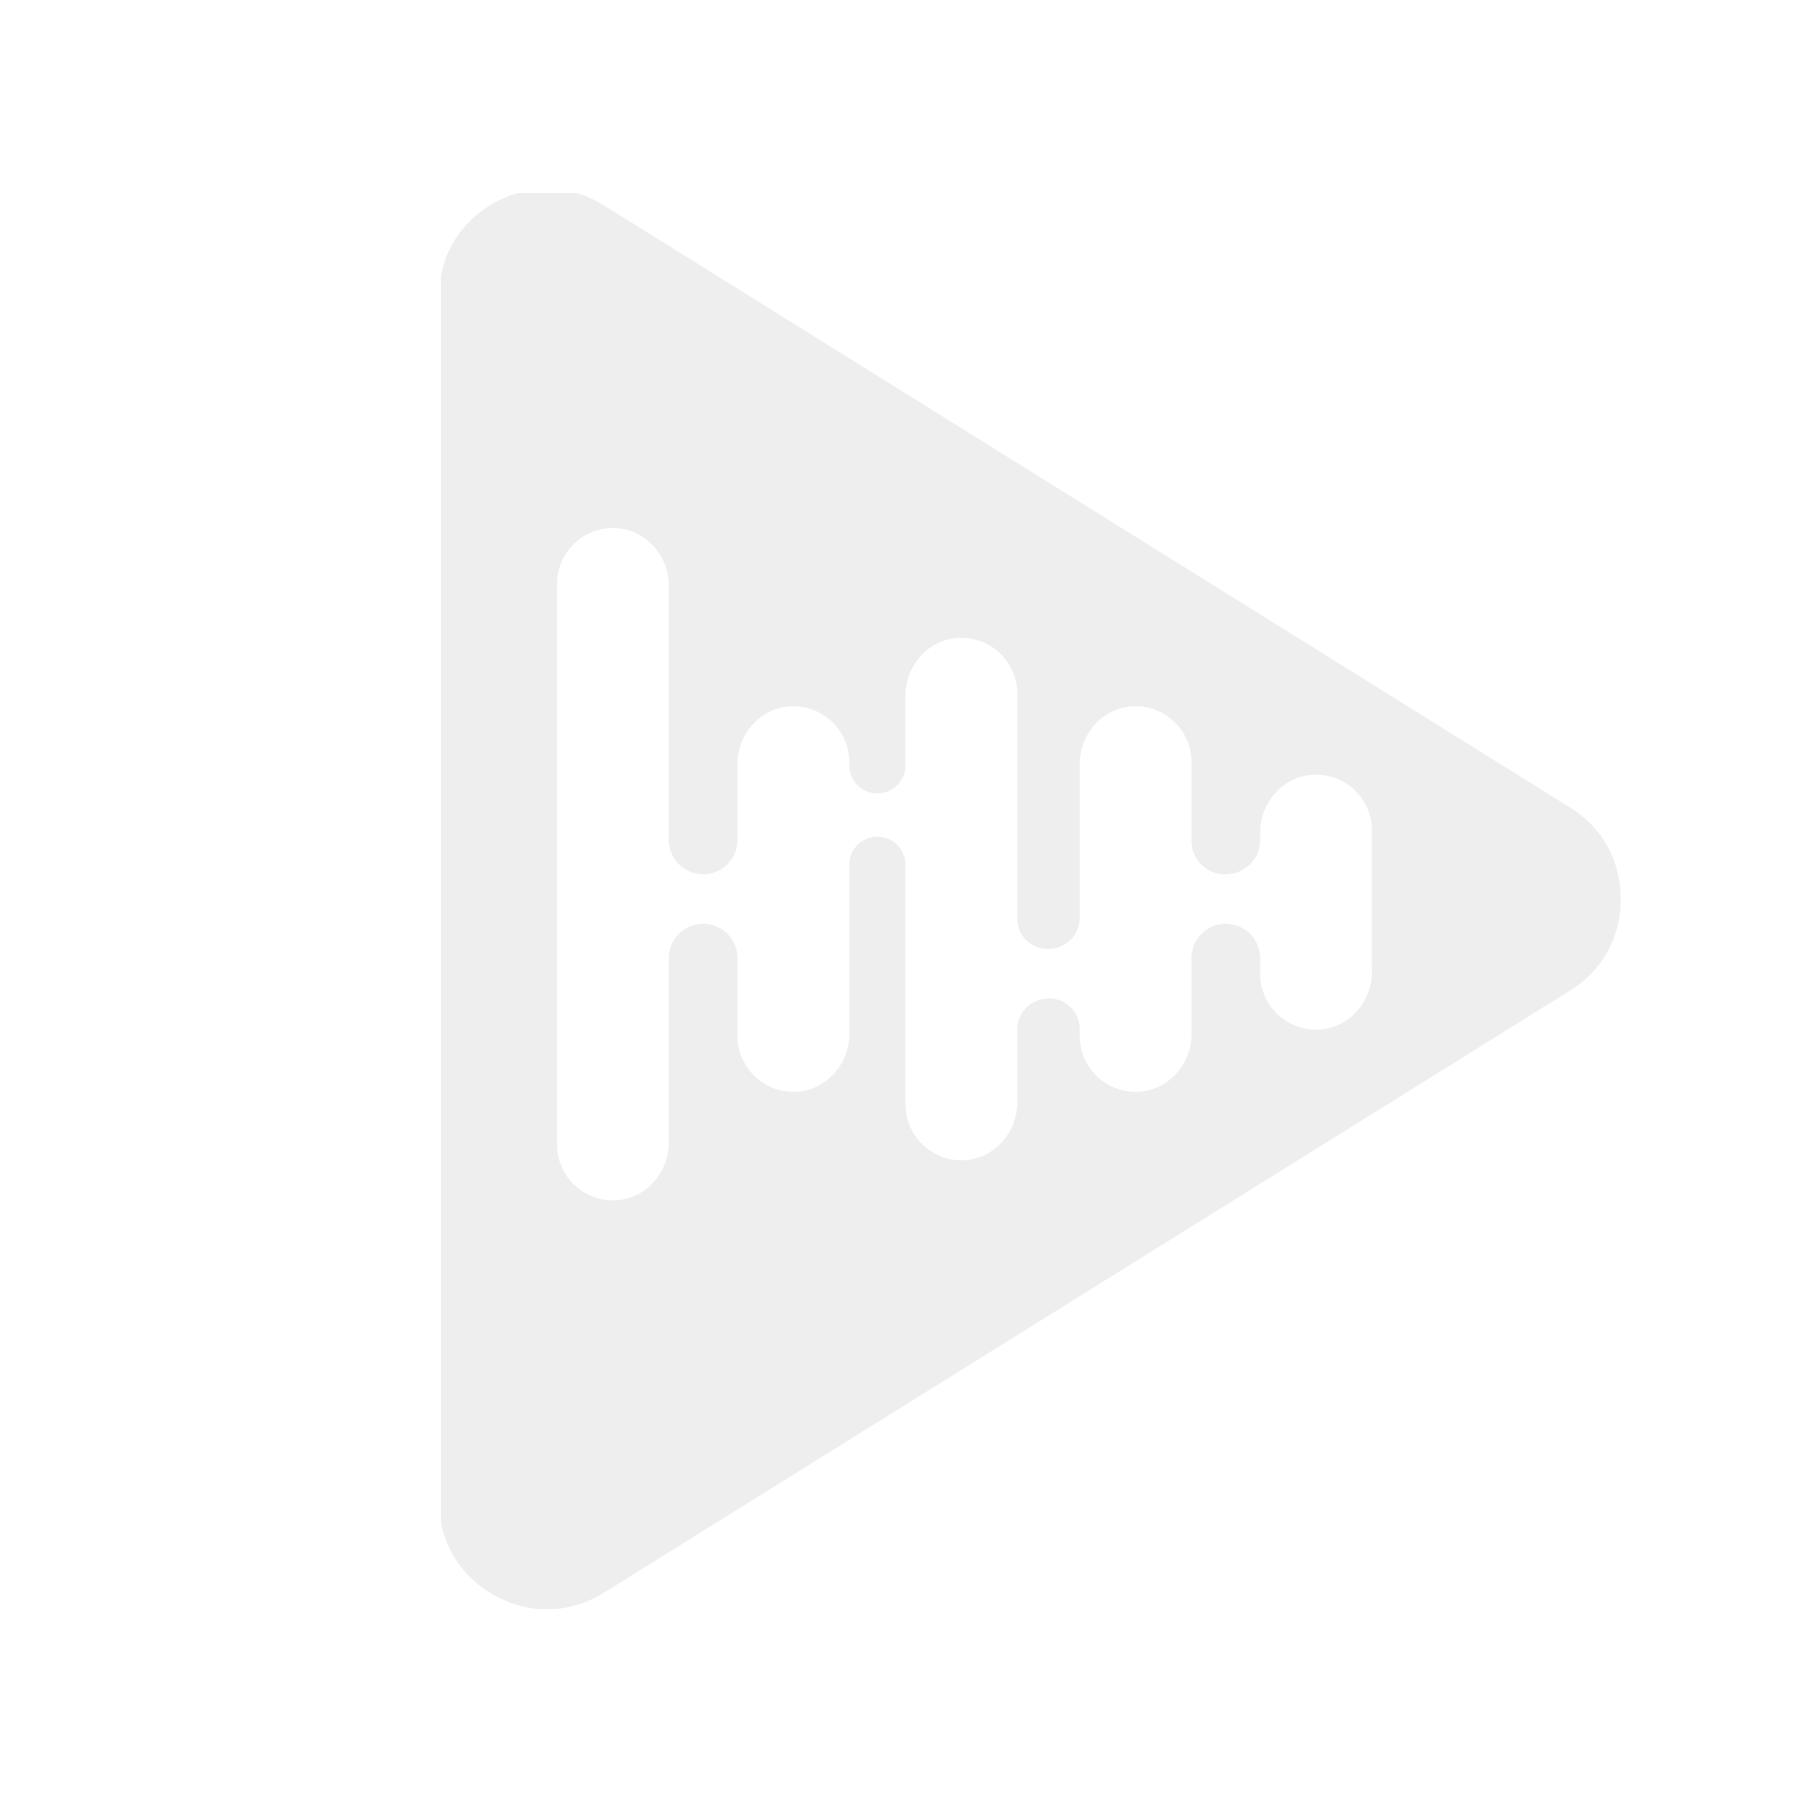 Epson 150015100 - Fjernkontroll, demovare